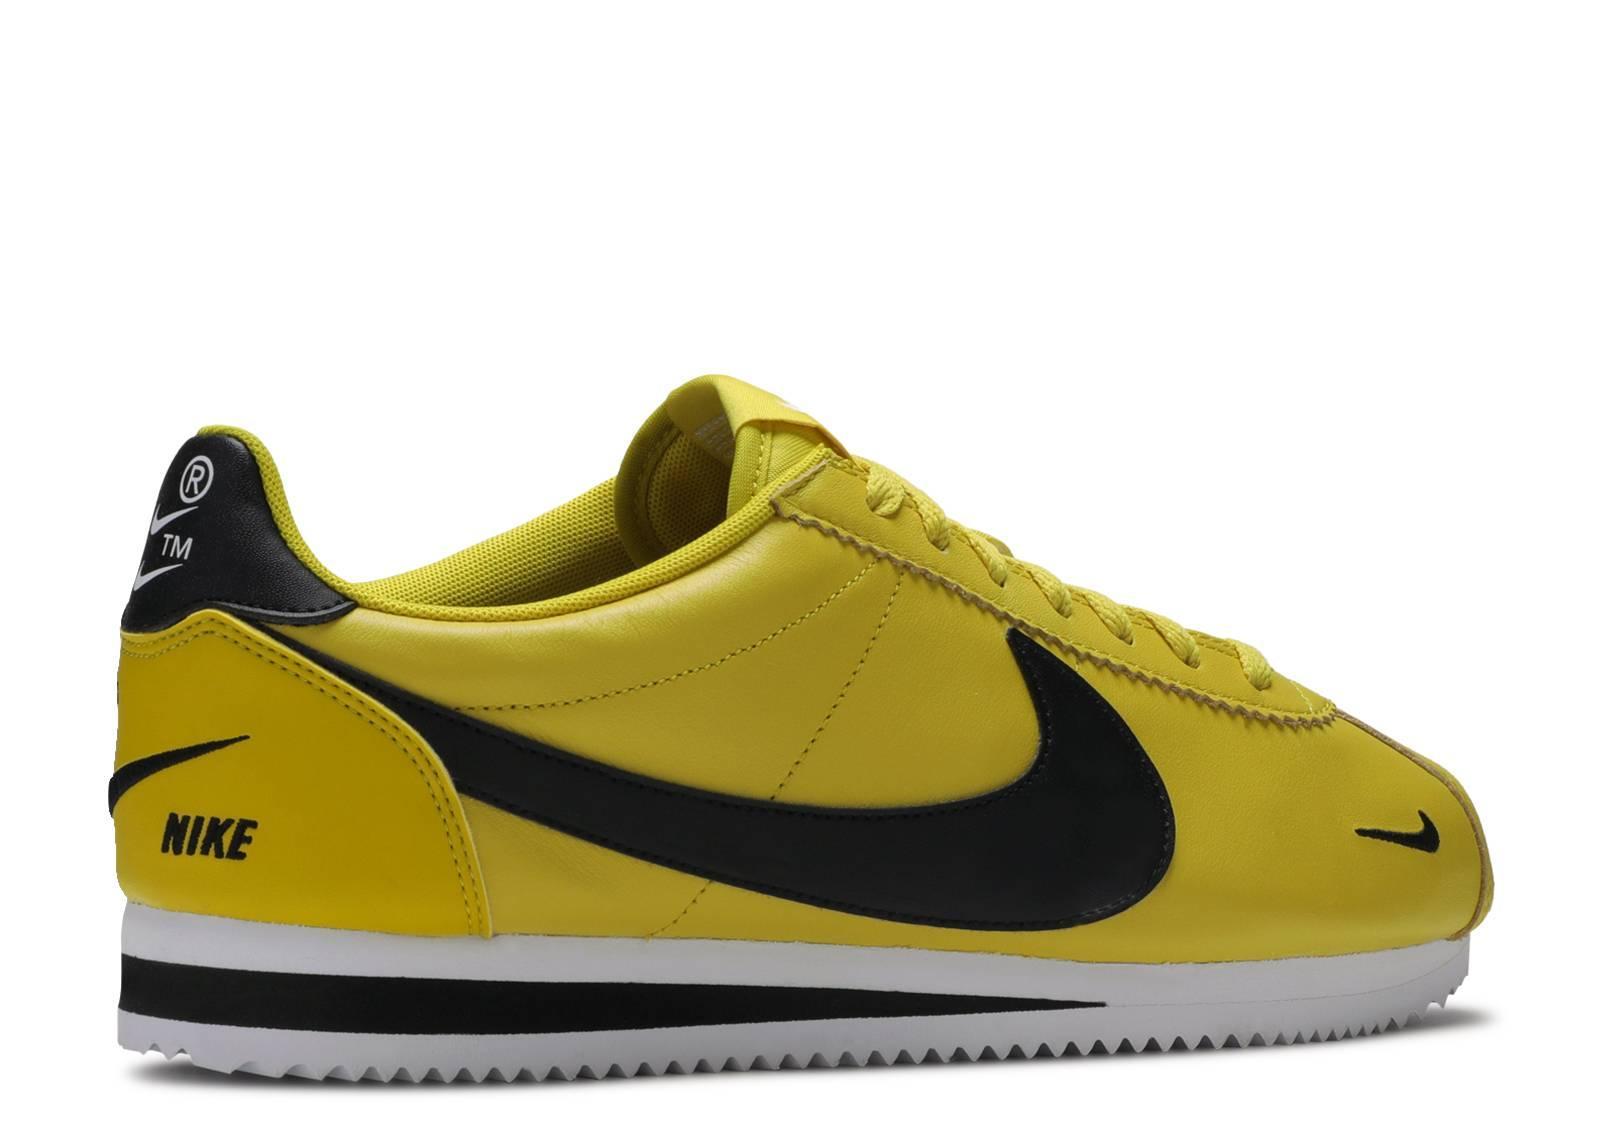 nike cortez premium yellow